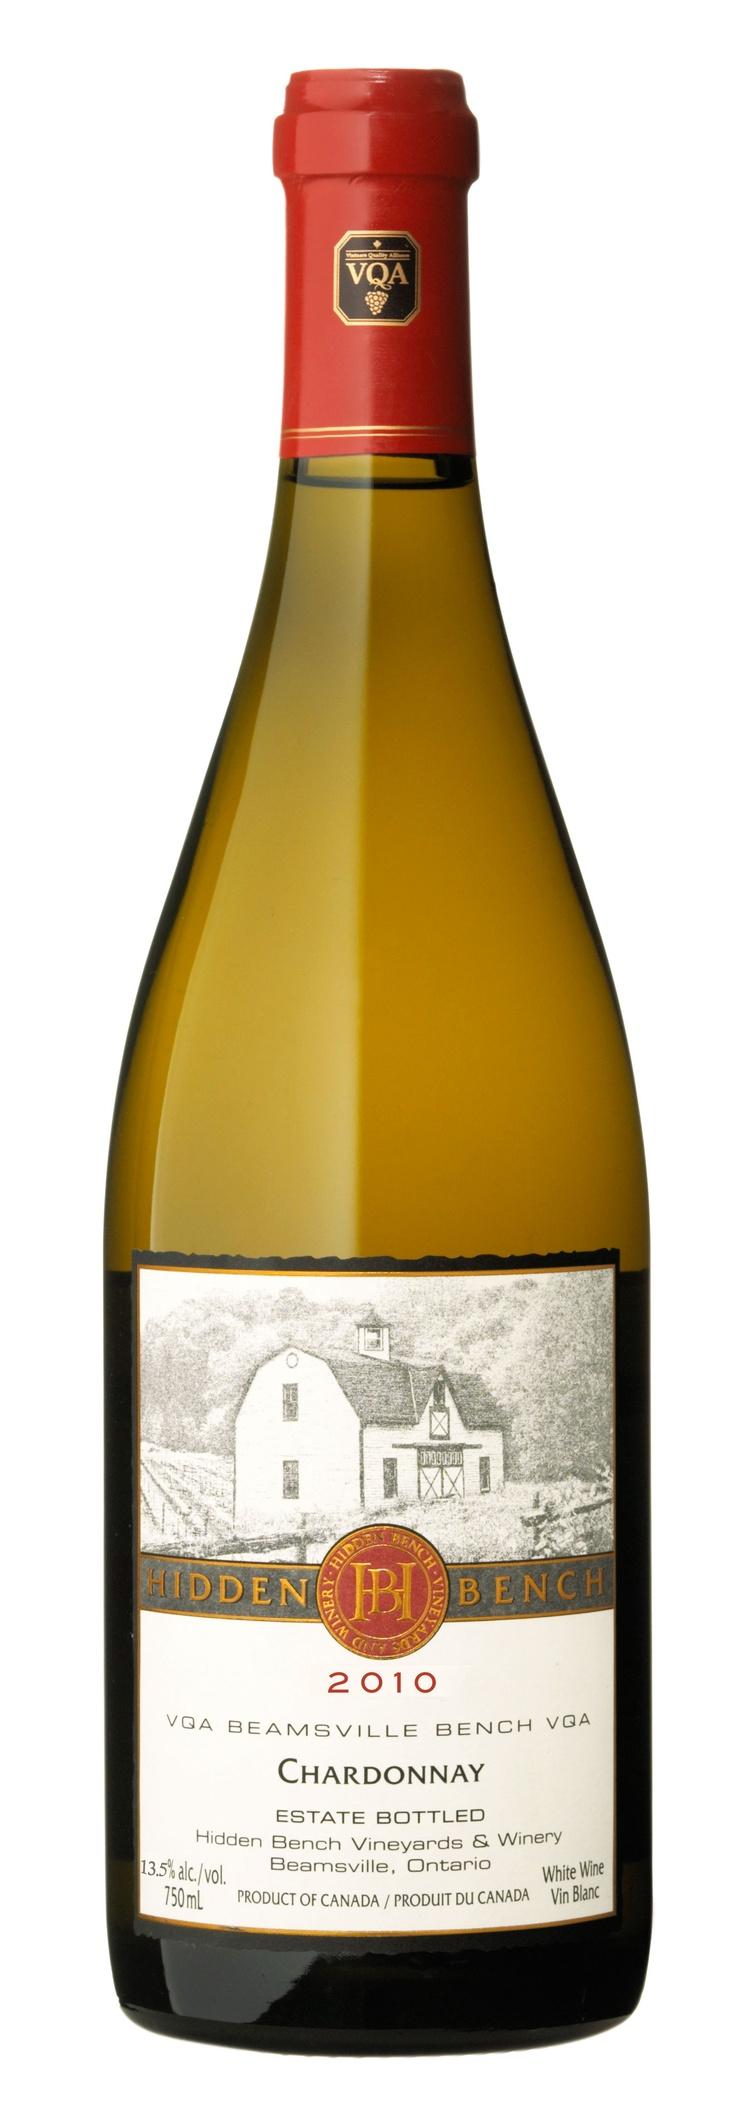 2010 Estate Bottled Chardonnay from Hidden Bench Vineyards & Winery, Beamsville, Ontario.